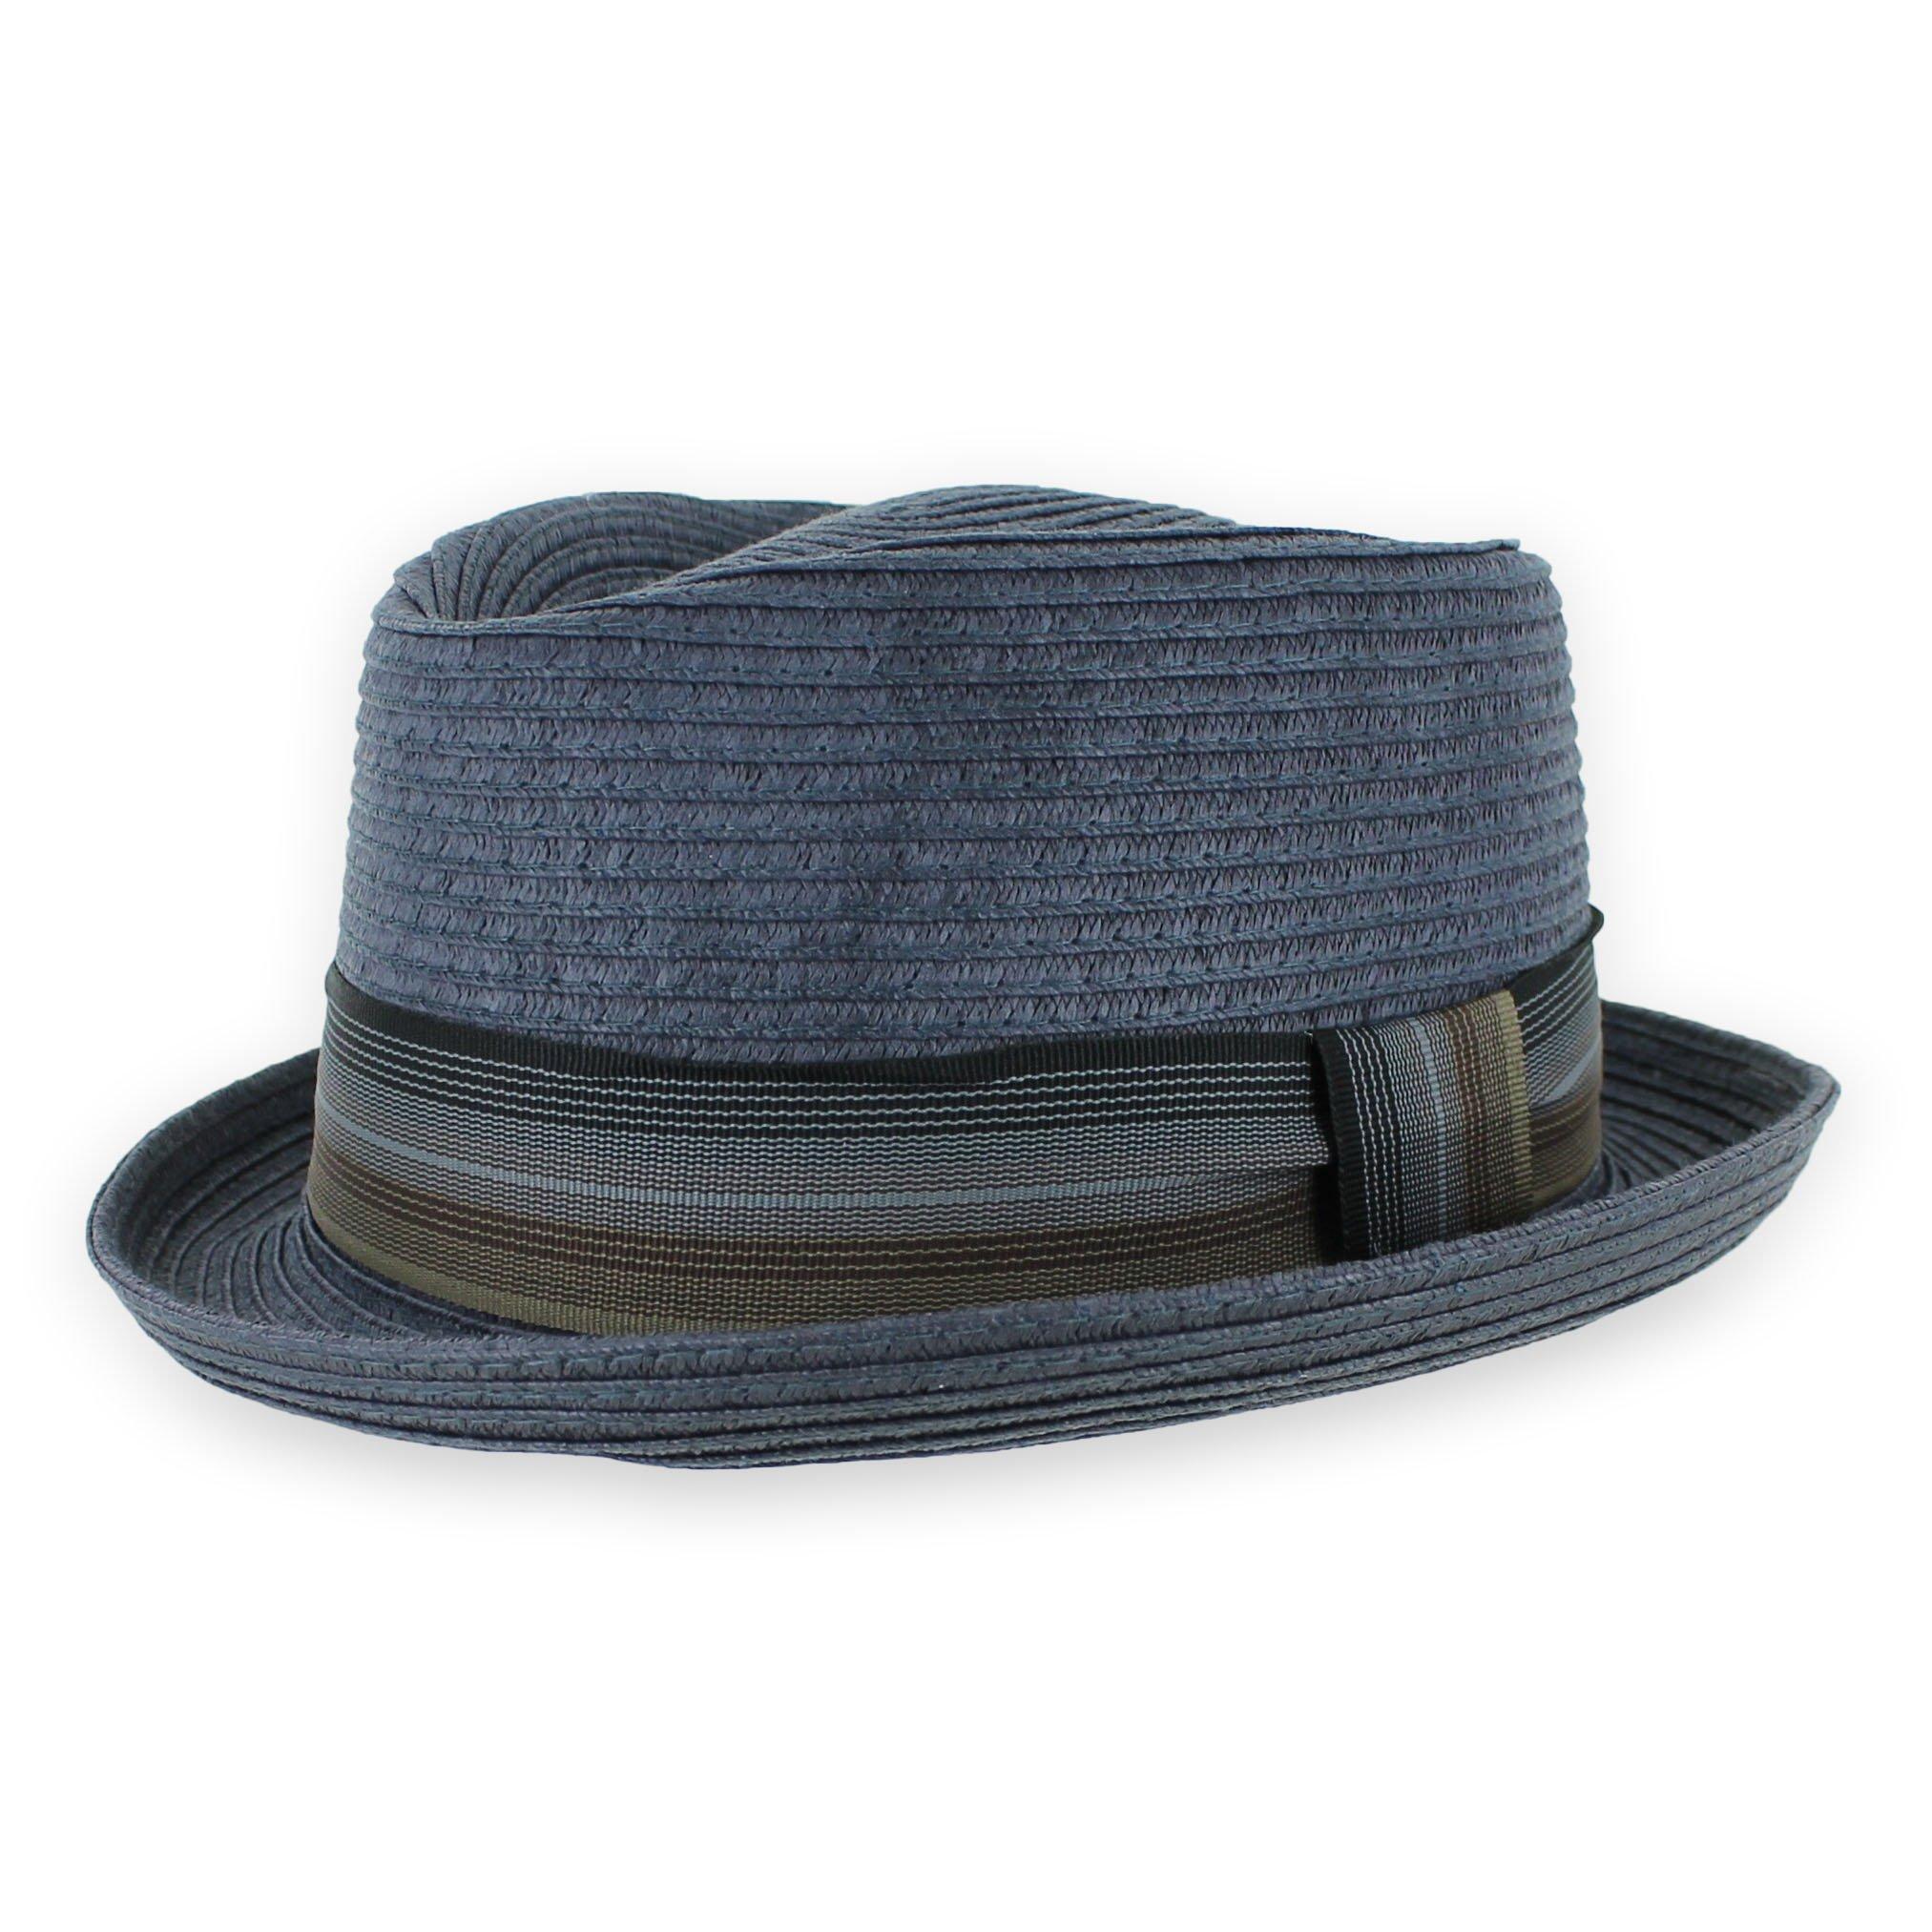 ab2aa075995448 Belfry Men/Women Summer Straw Pork Pie Trilby Fedora Hat in Blue, Tan,